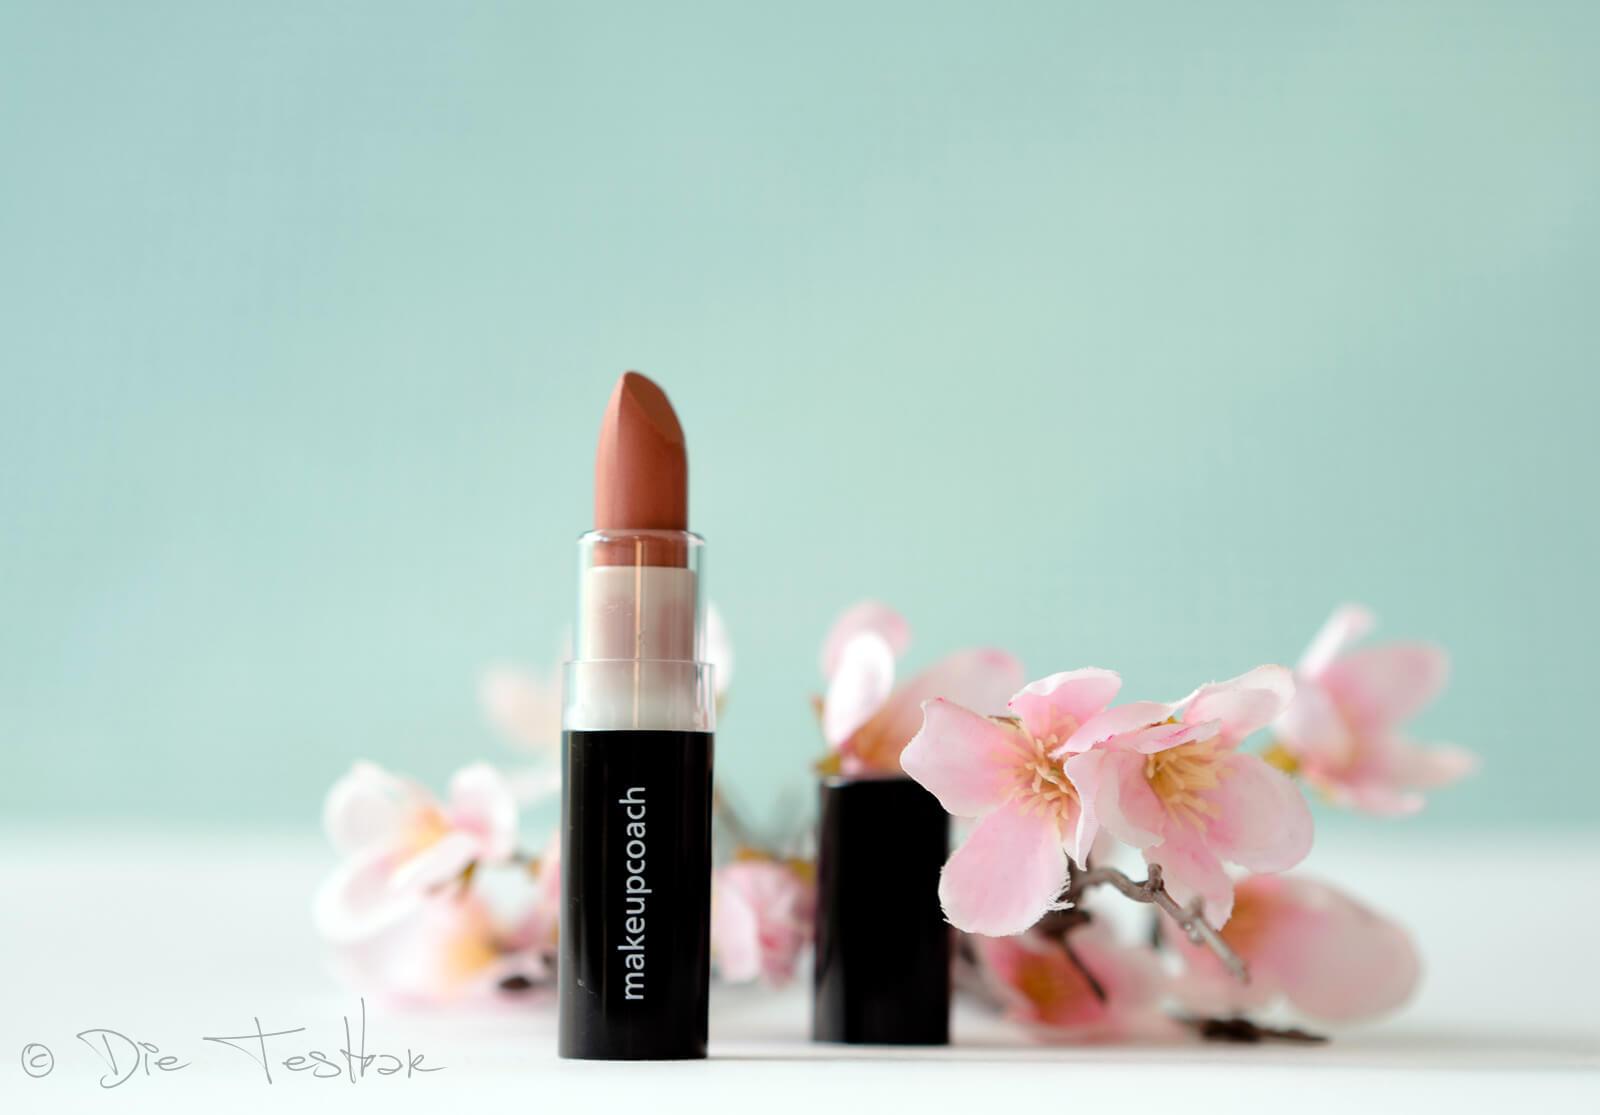 Lippen Samt - Nackidei